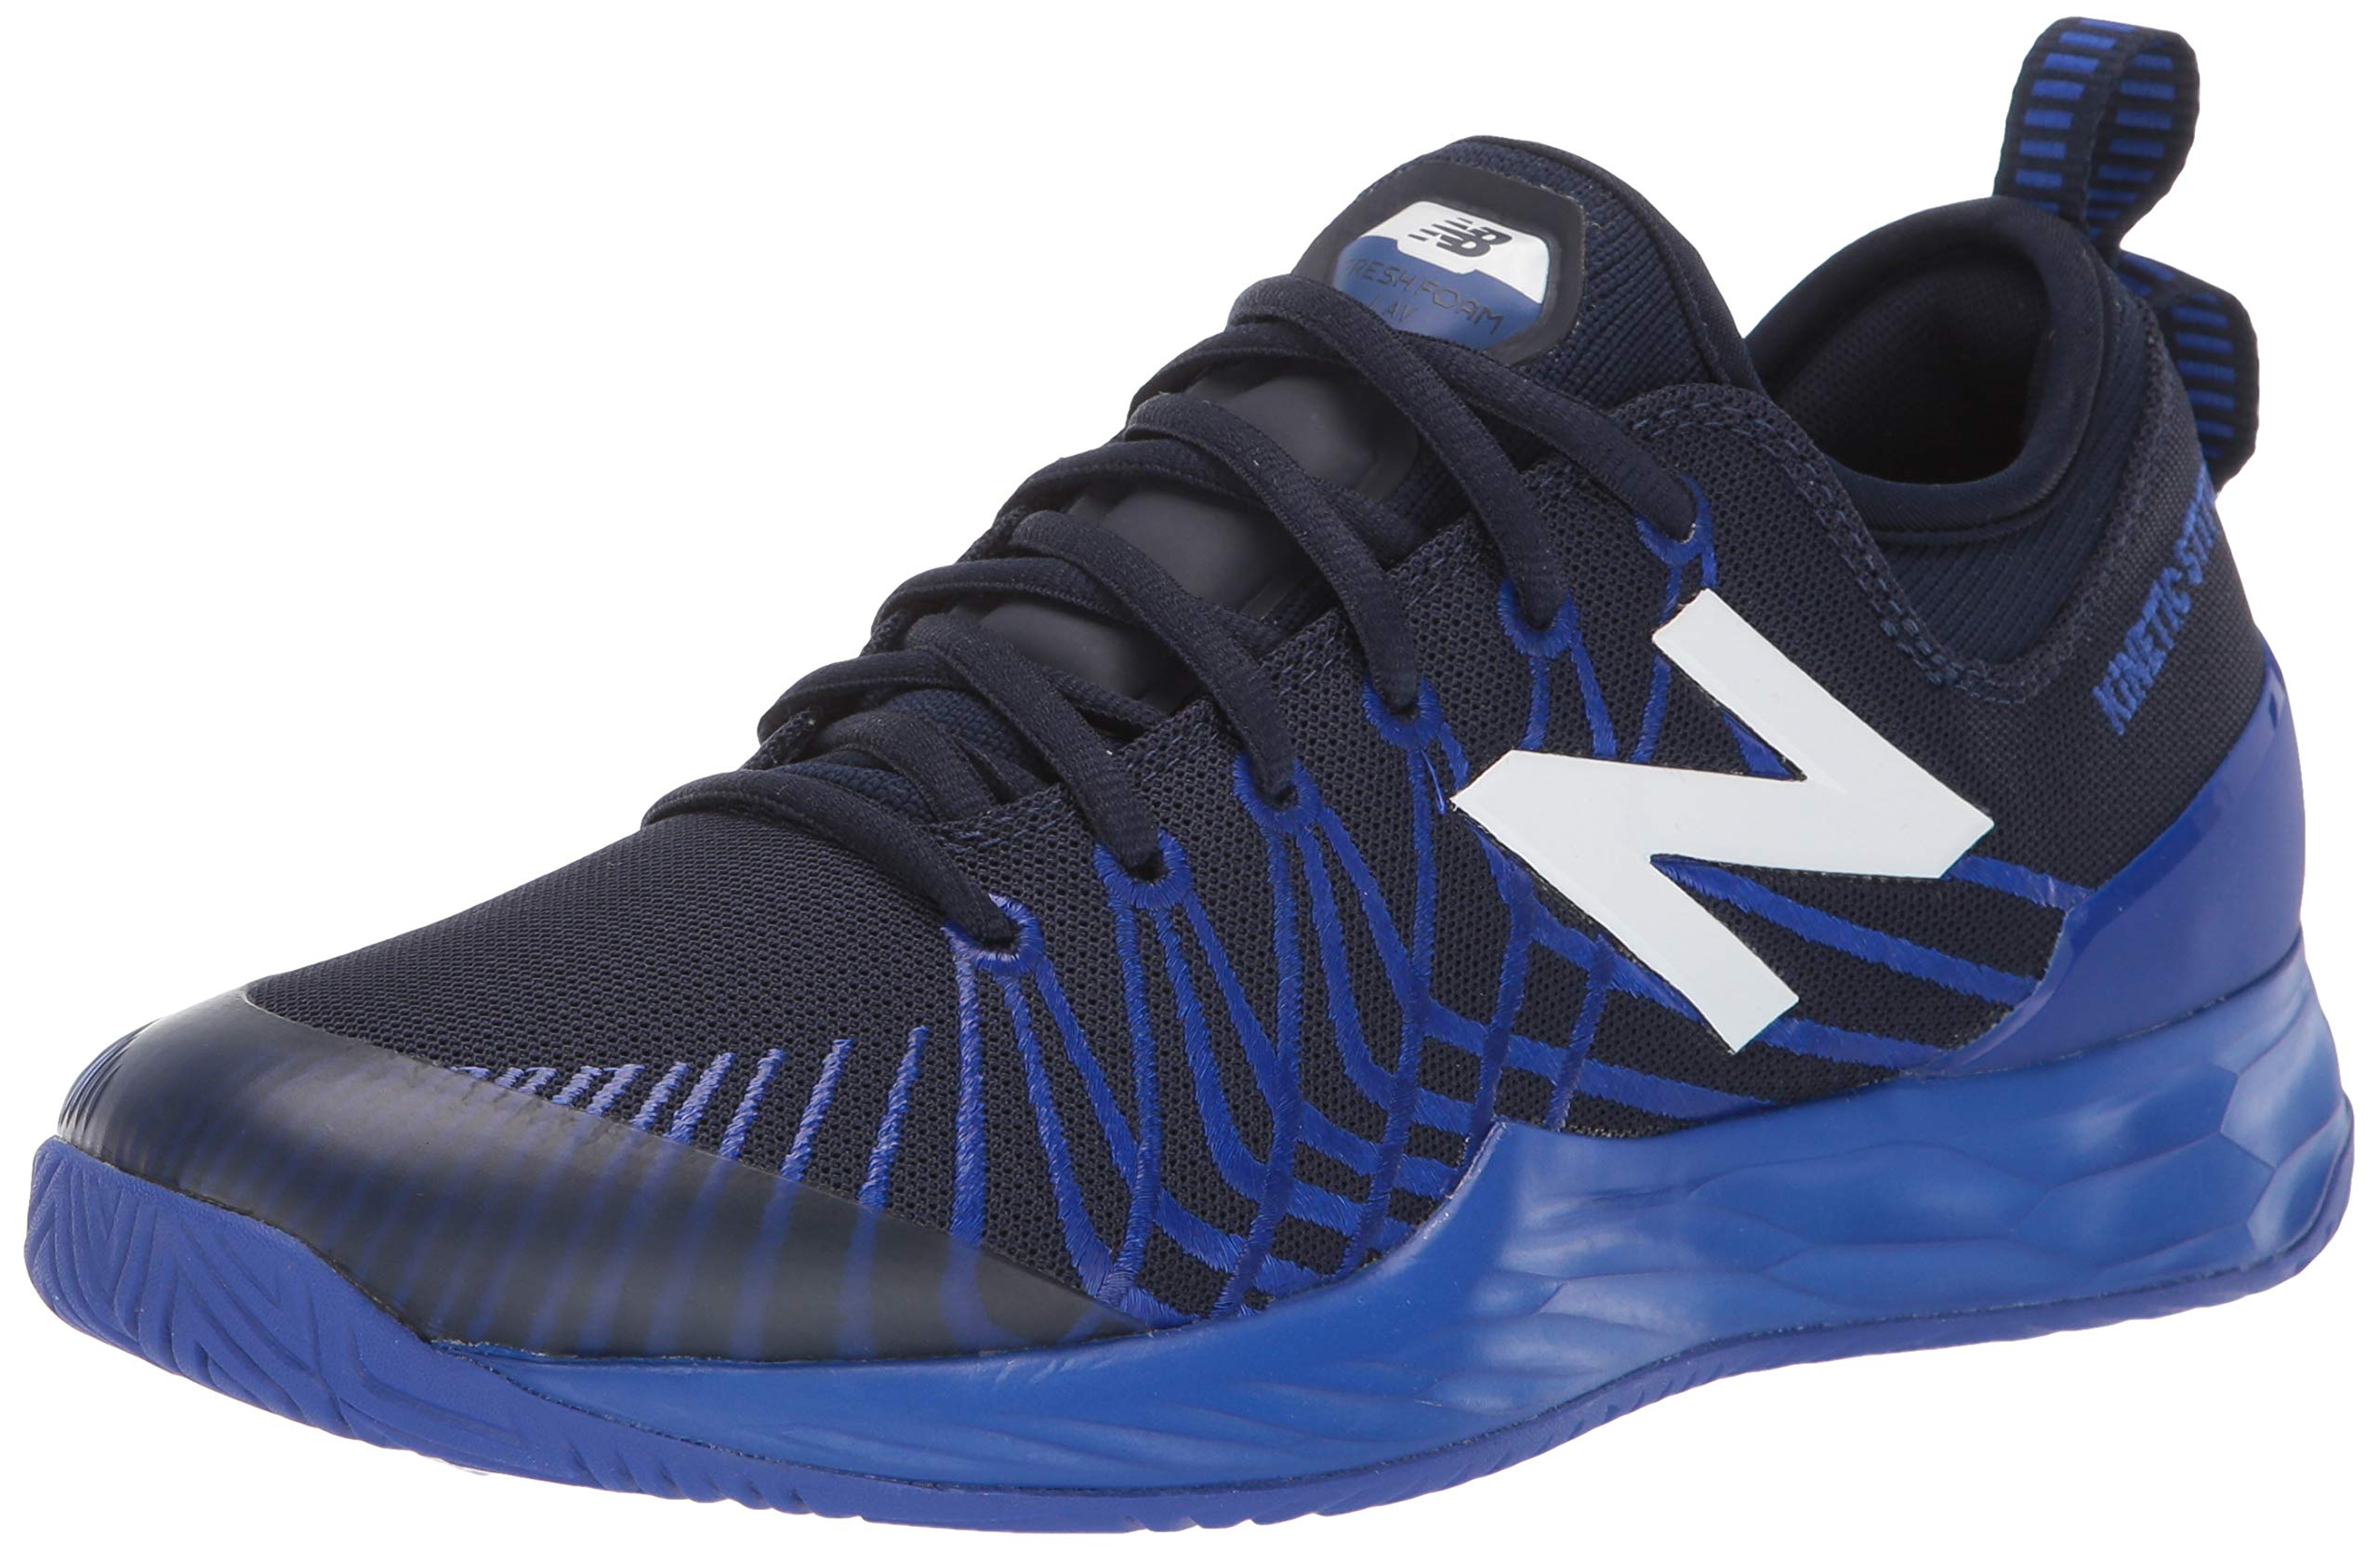 New Balance Men's LAV V1 Hard Court Tennis Shoe, Pigment/UV Blue, 5 D US